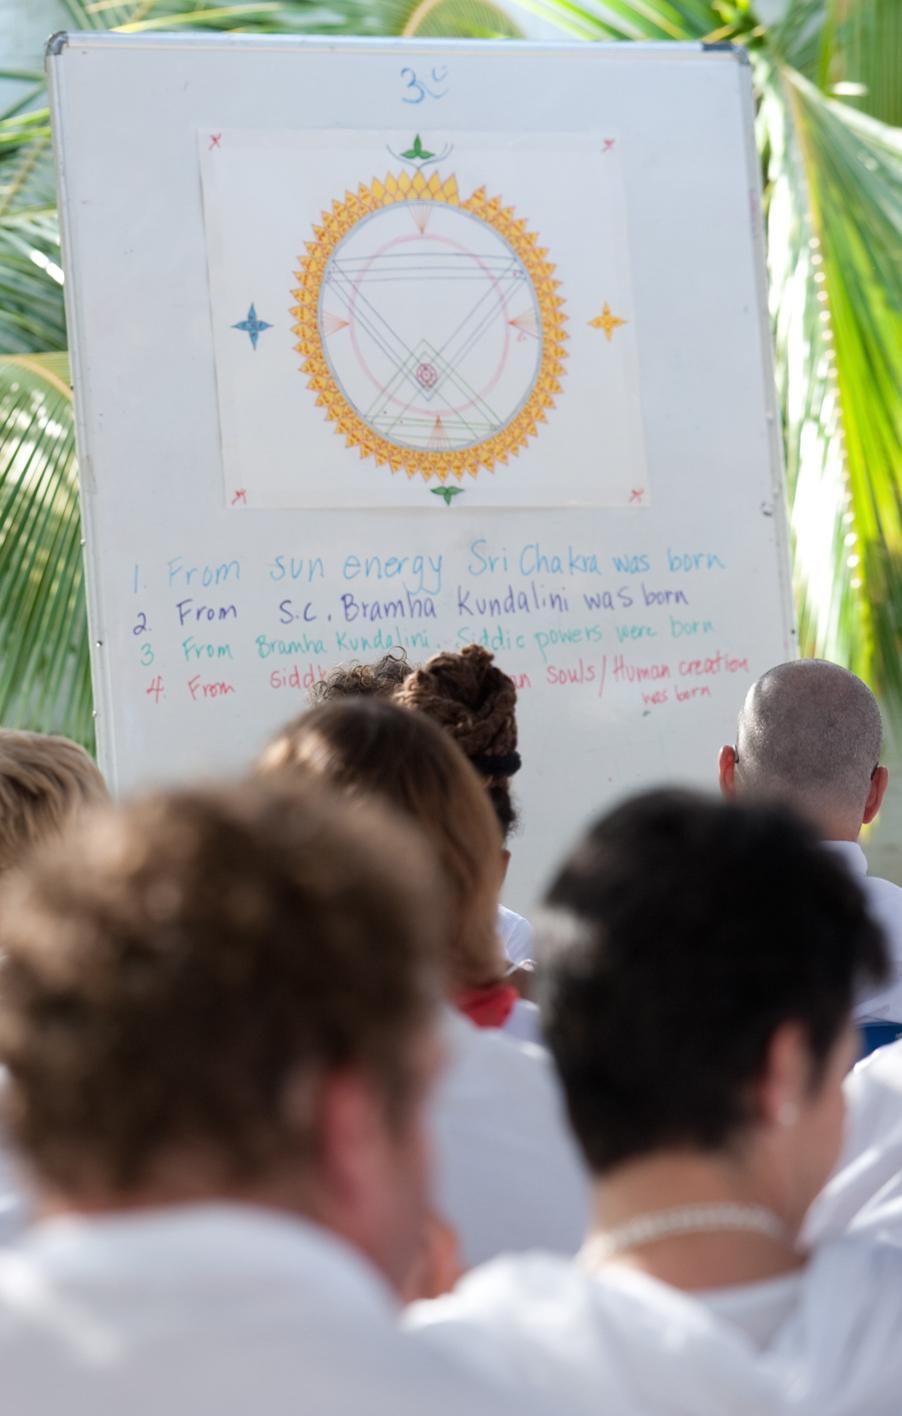 Sri Chakra Lehrveranstaltung an der Seelenuniversität in Penukonda, Indien